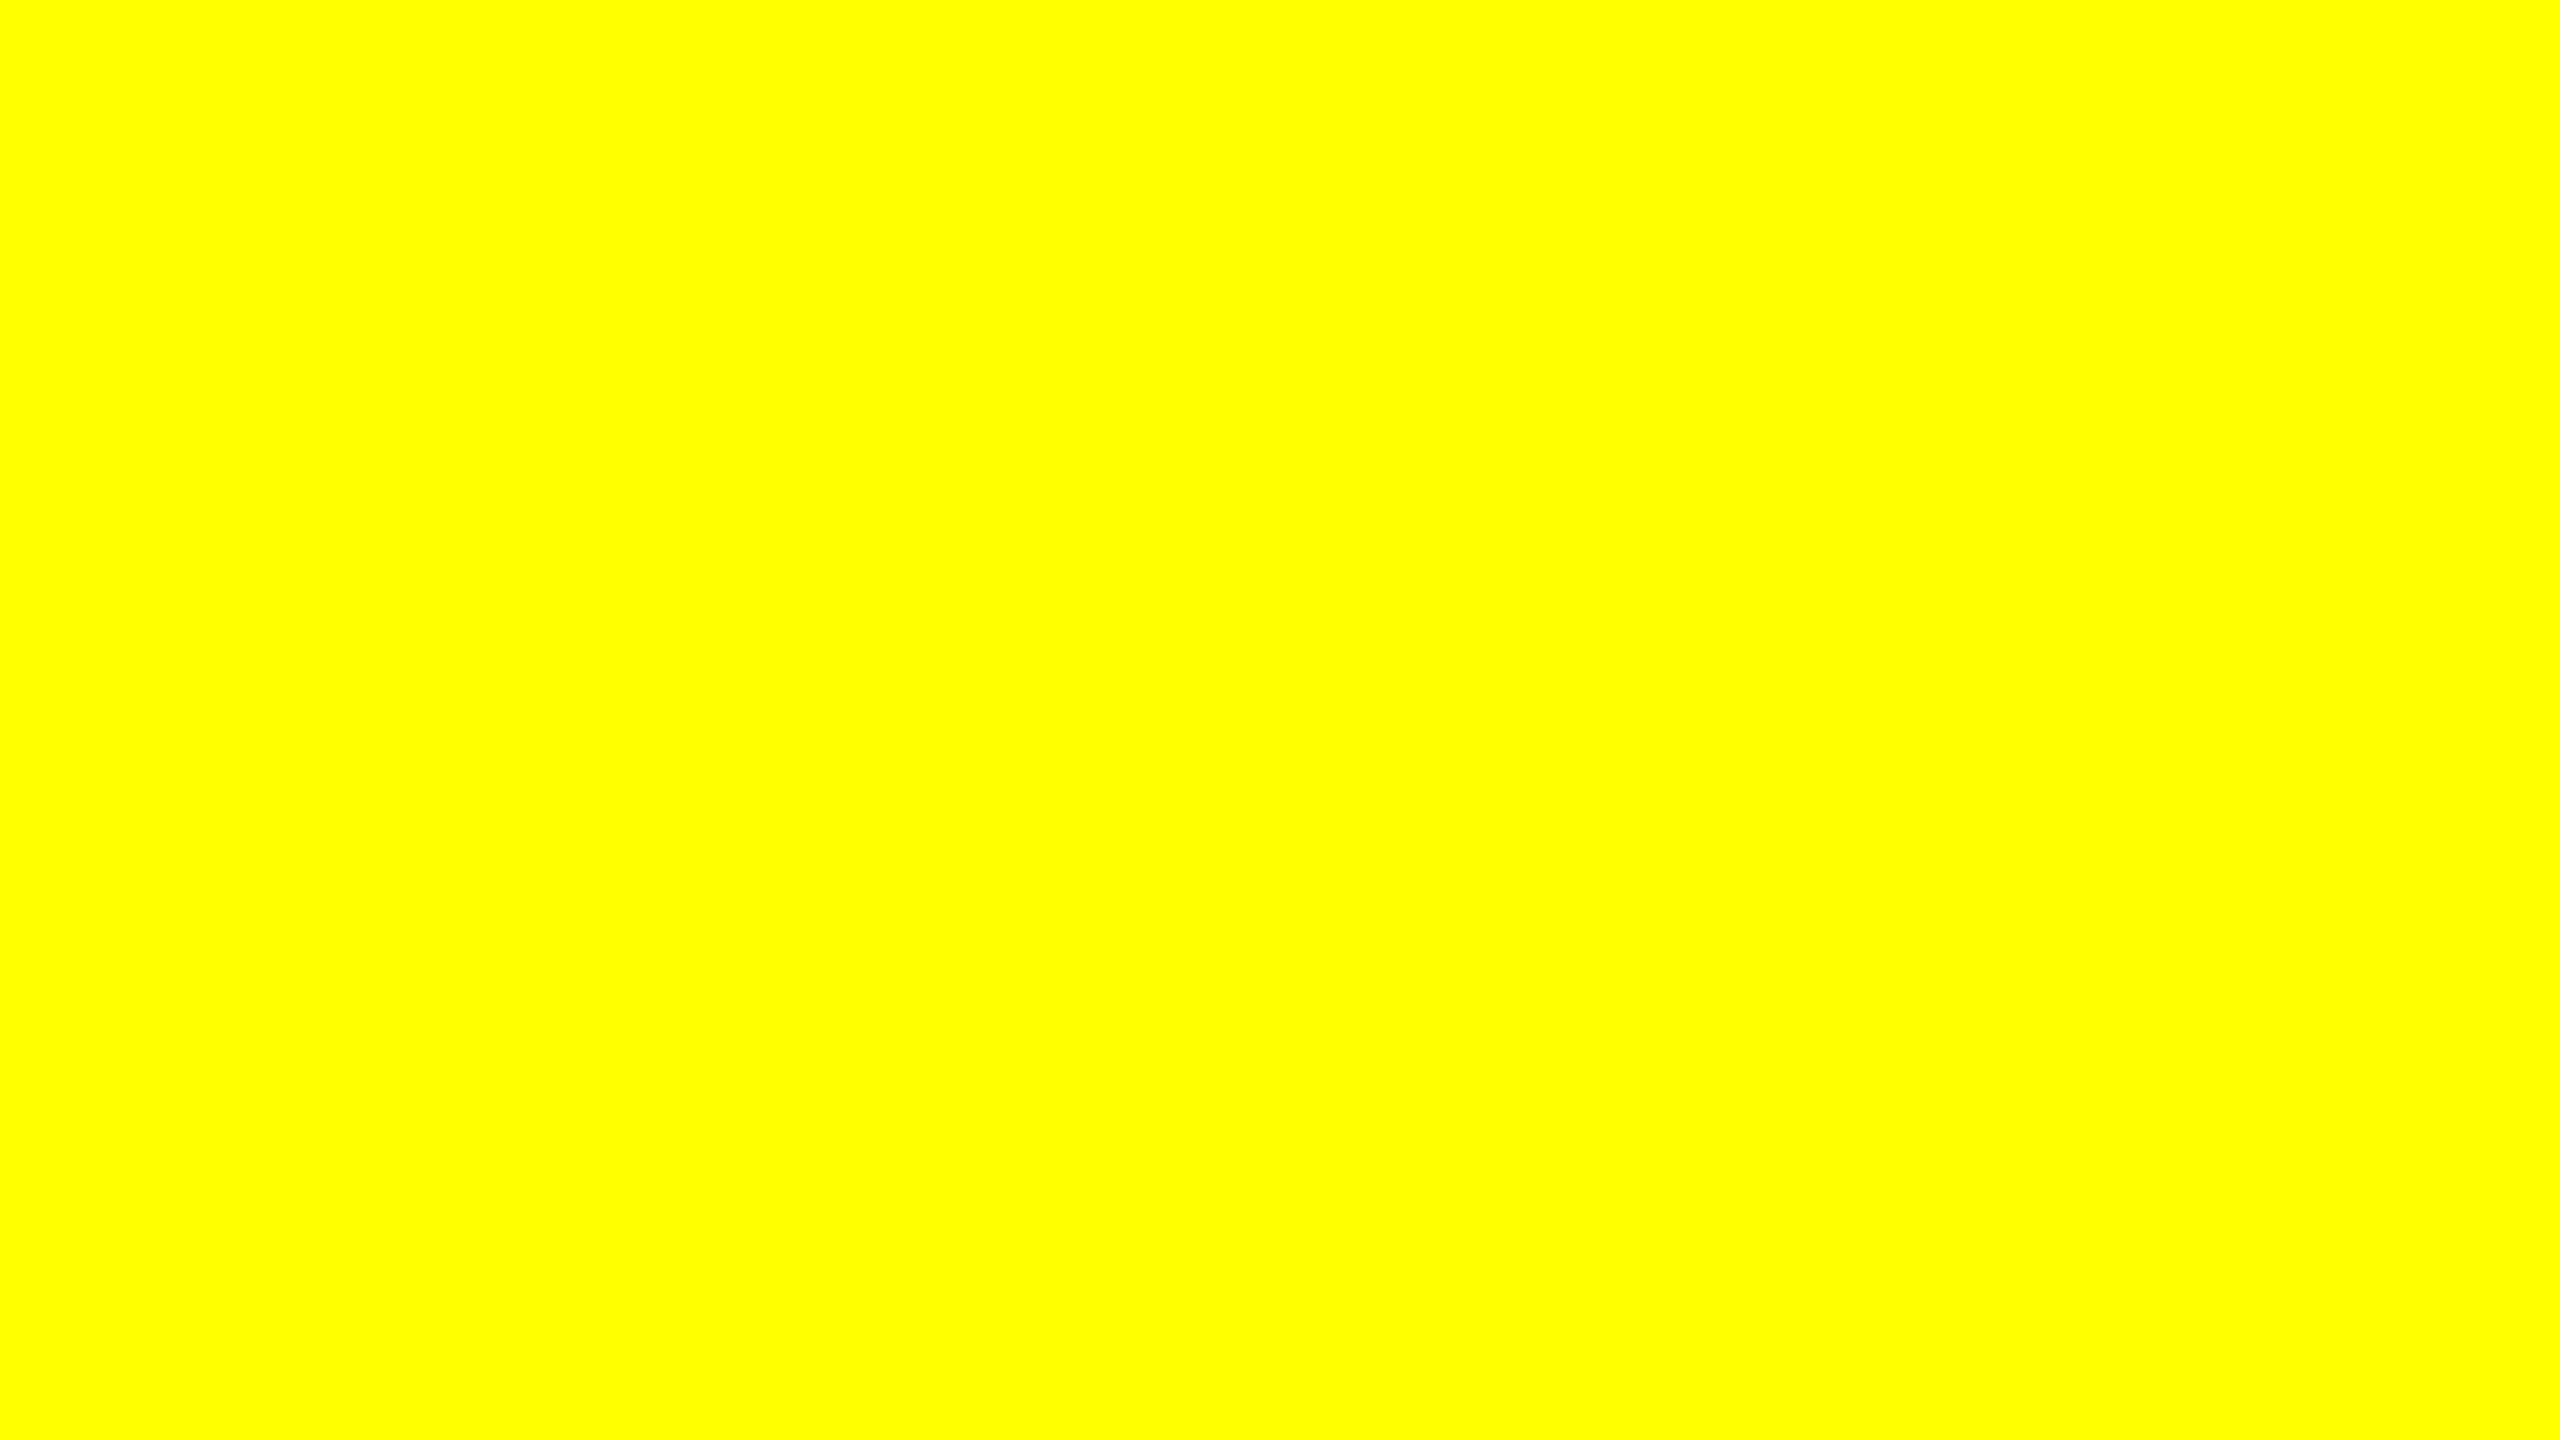 Neon Yellow Background - WallpaperSafari